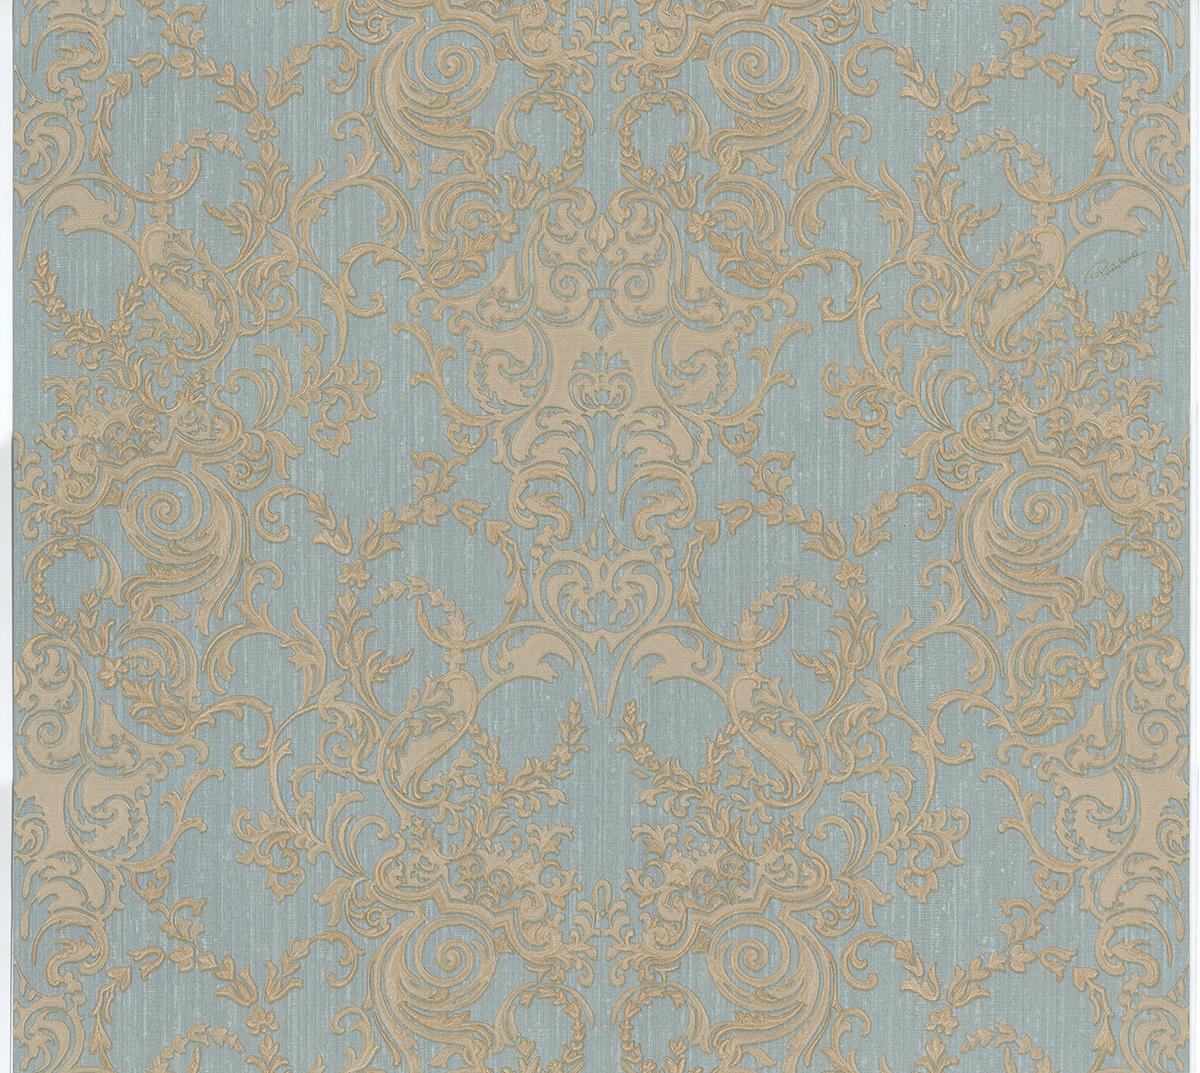 Roberto Cavalli Barocco RC15024 Wallpaper BlueGold Fashion 1200x1073